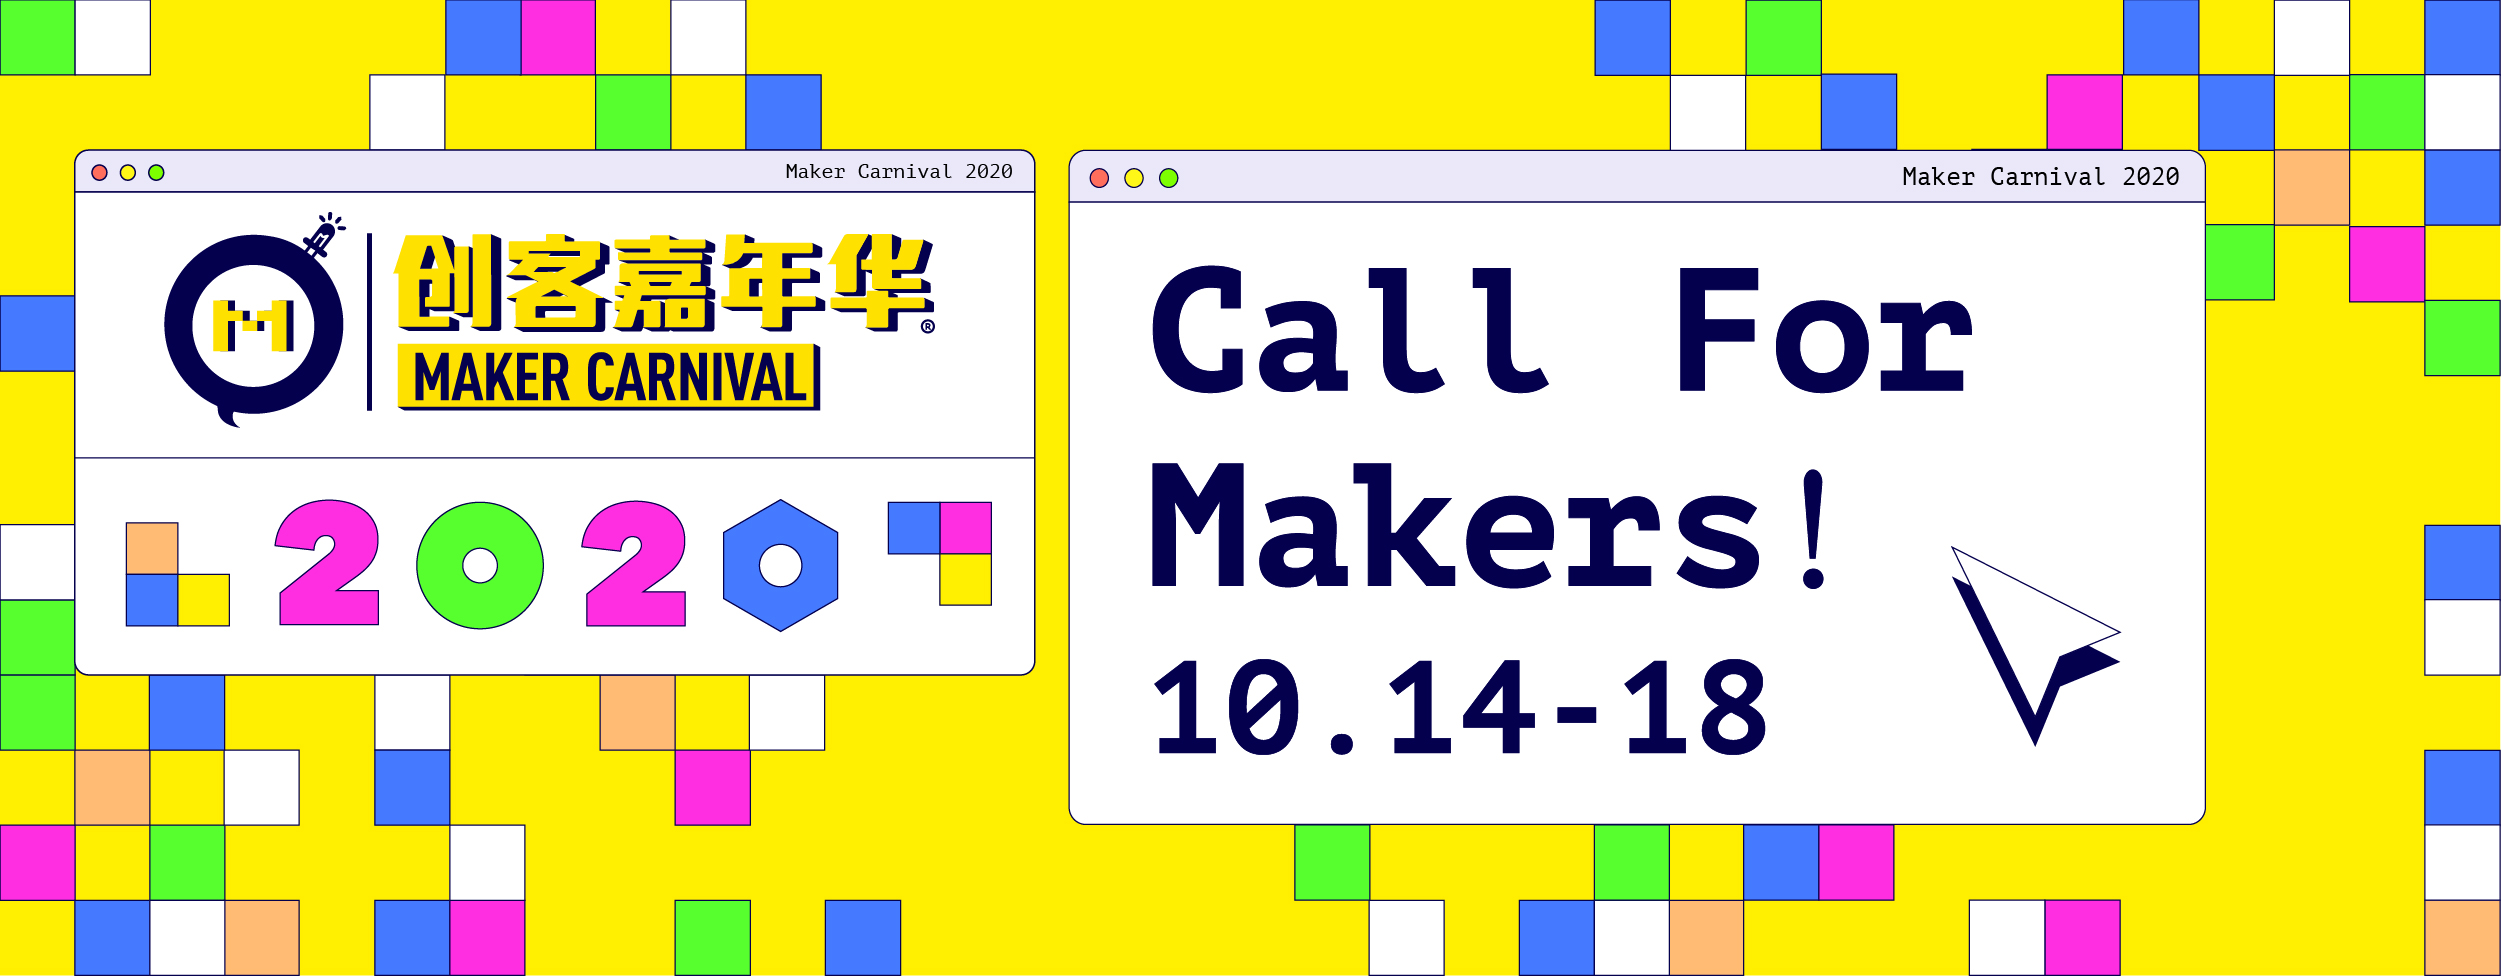 2020 Maker Carnival Call for Makers